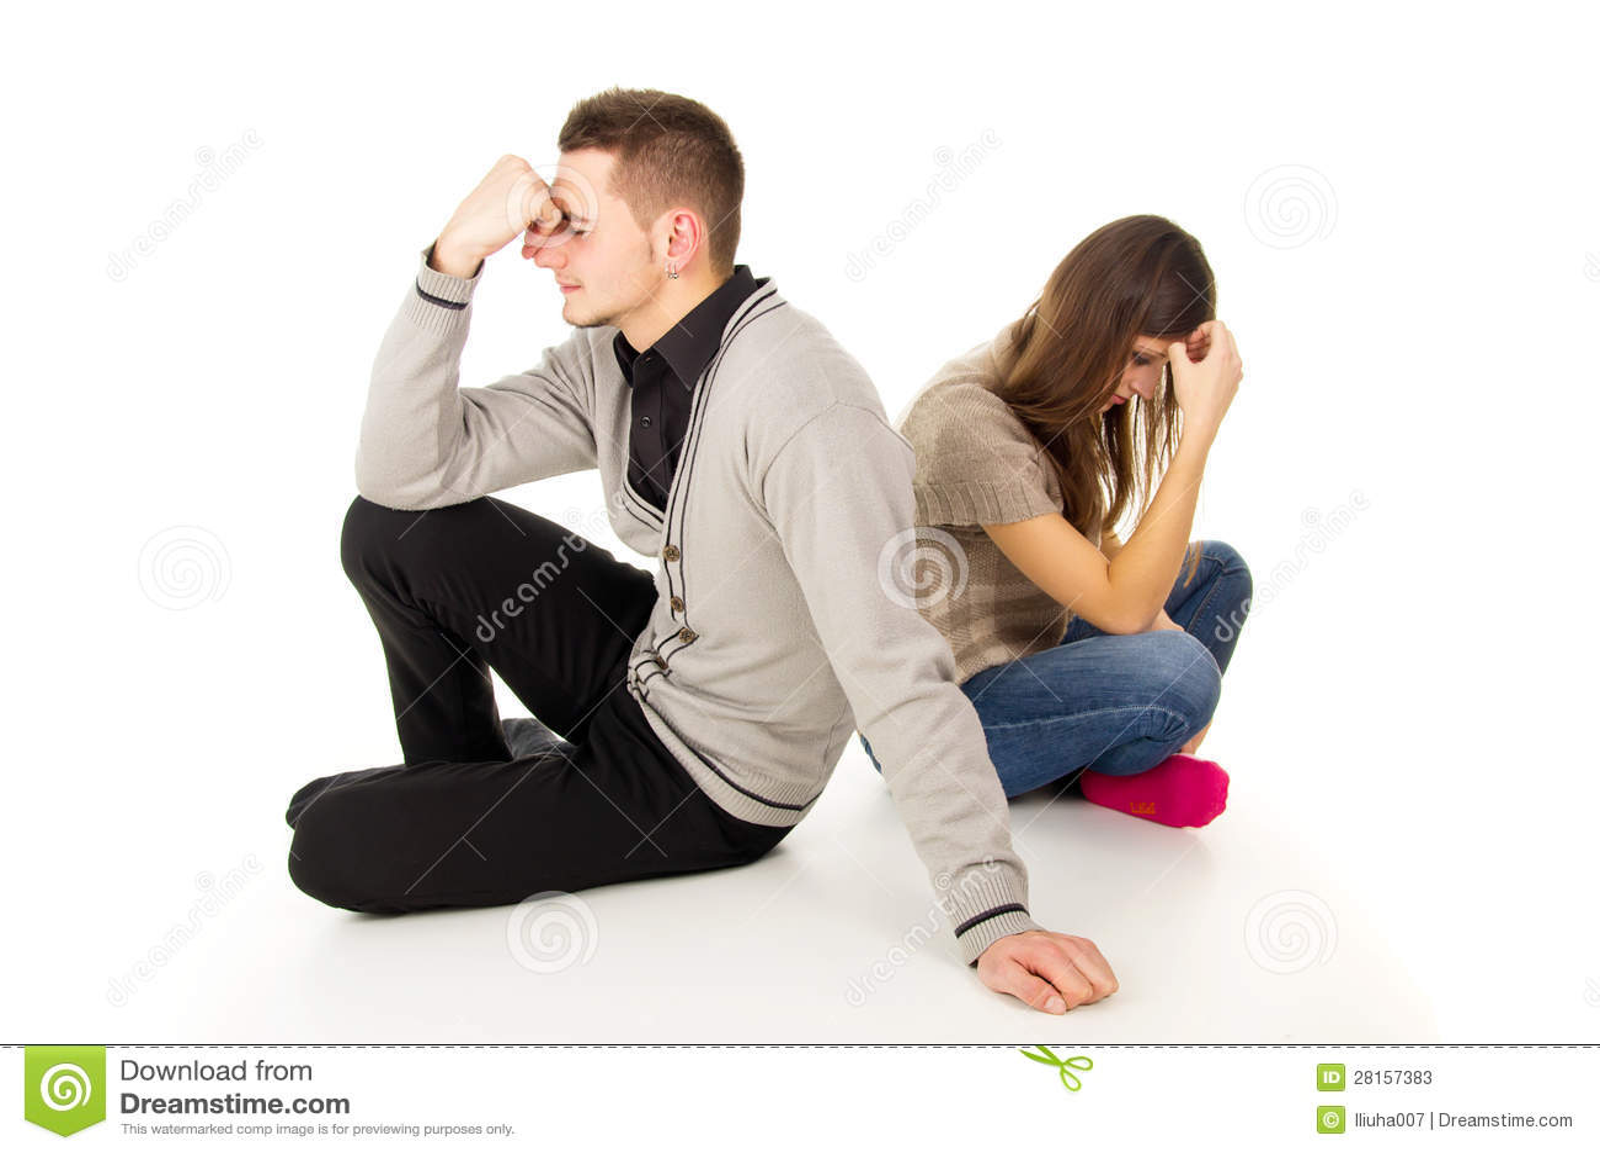 Boy And Girl Sit Sad Stock Image Image Of Betrayal, Friendship - 28157383-3485